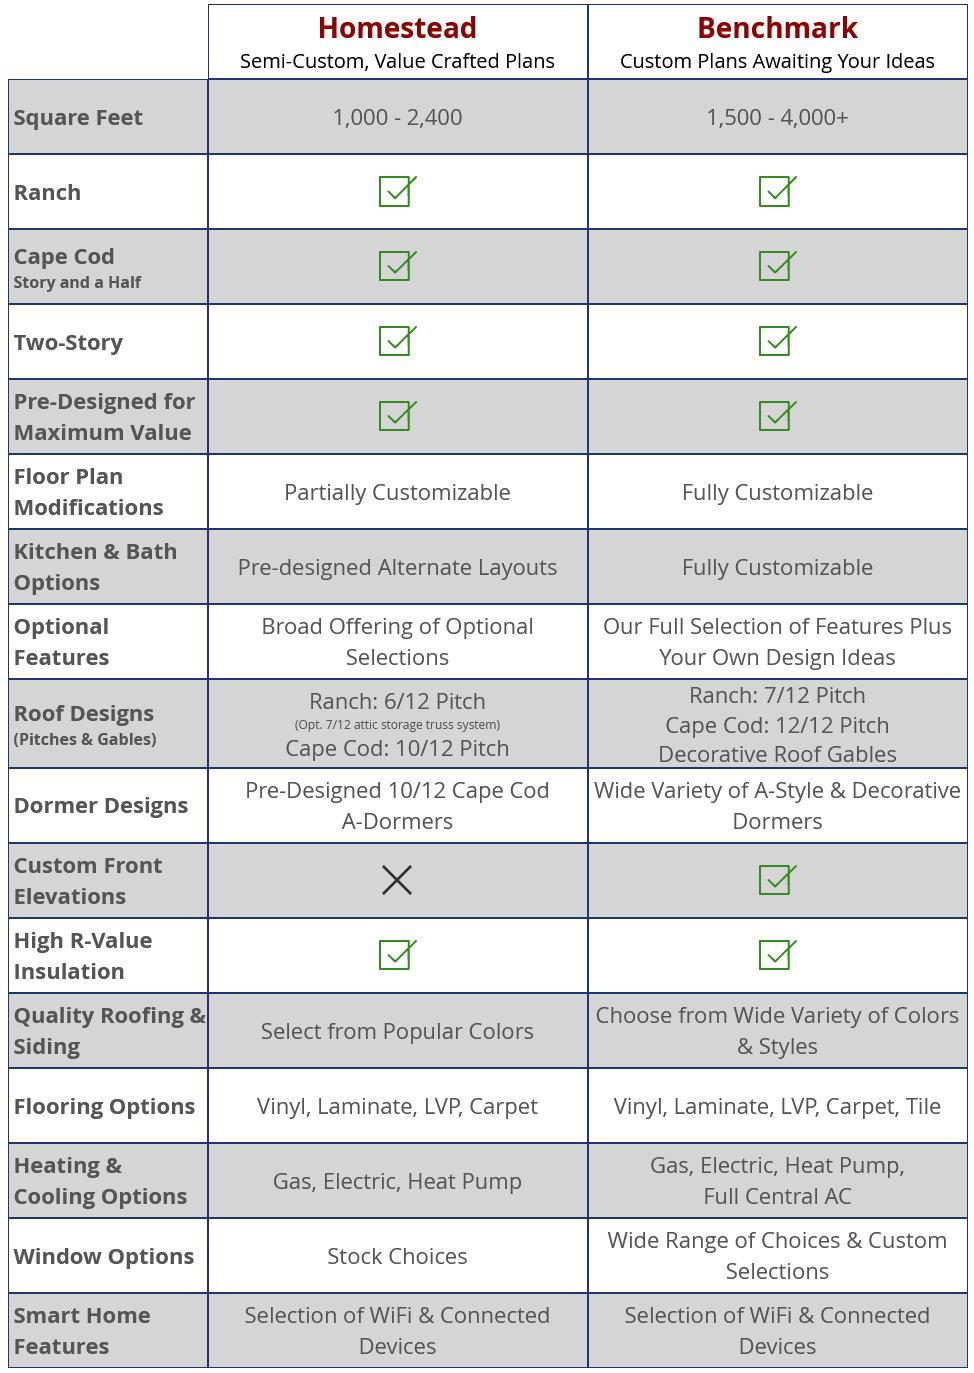 compare-floorplans-chart.jpg